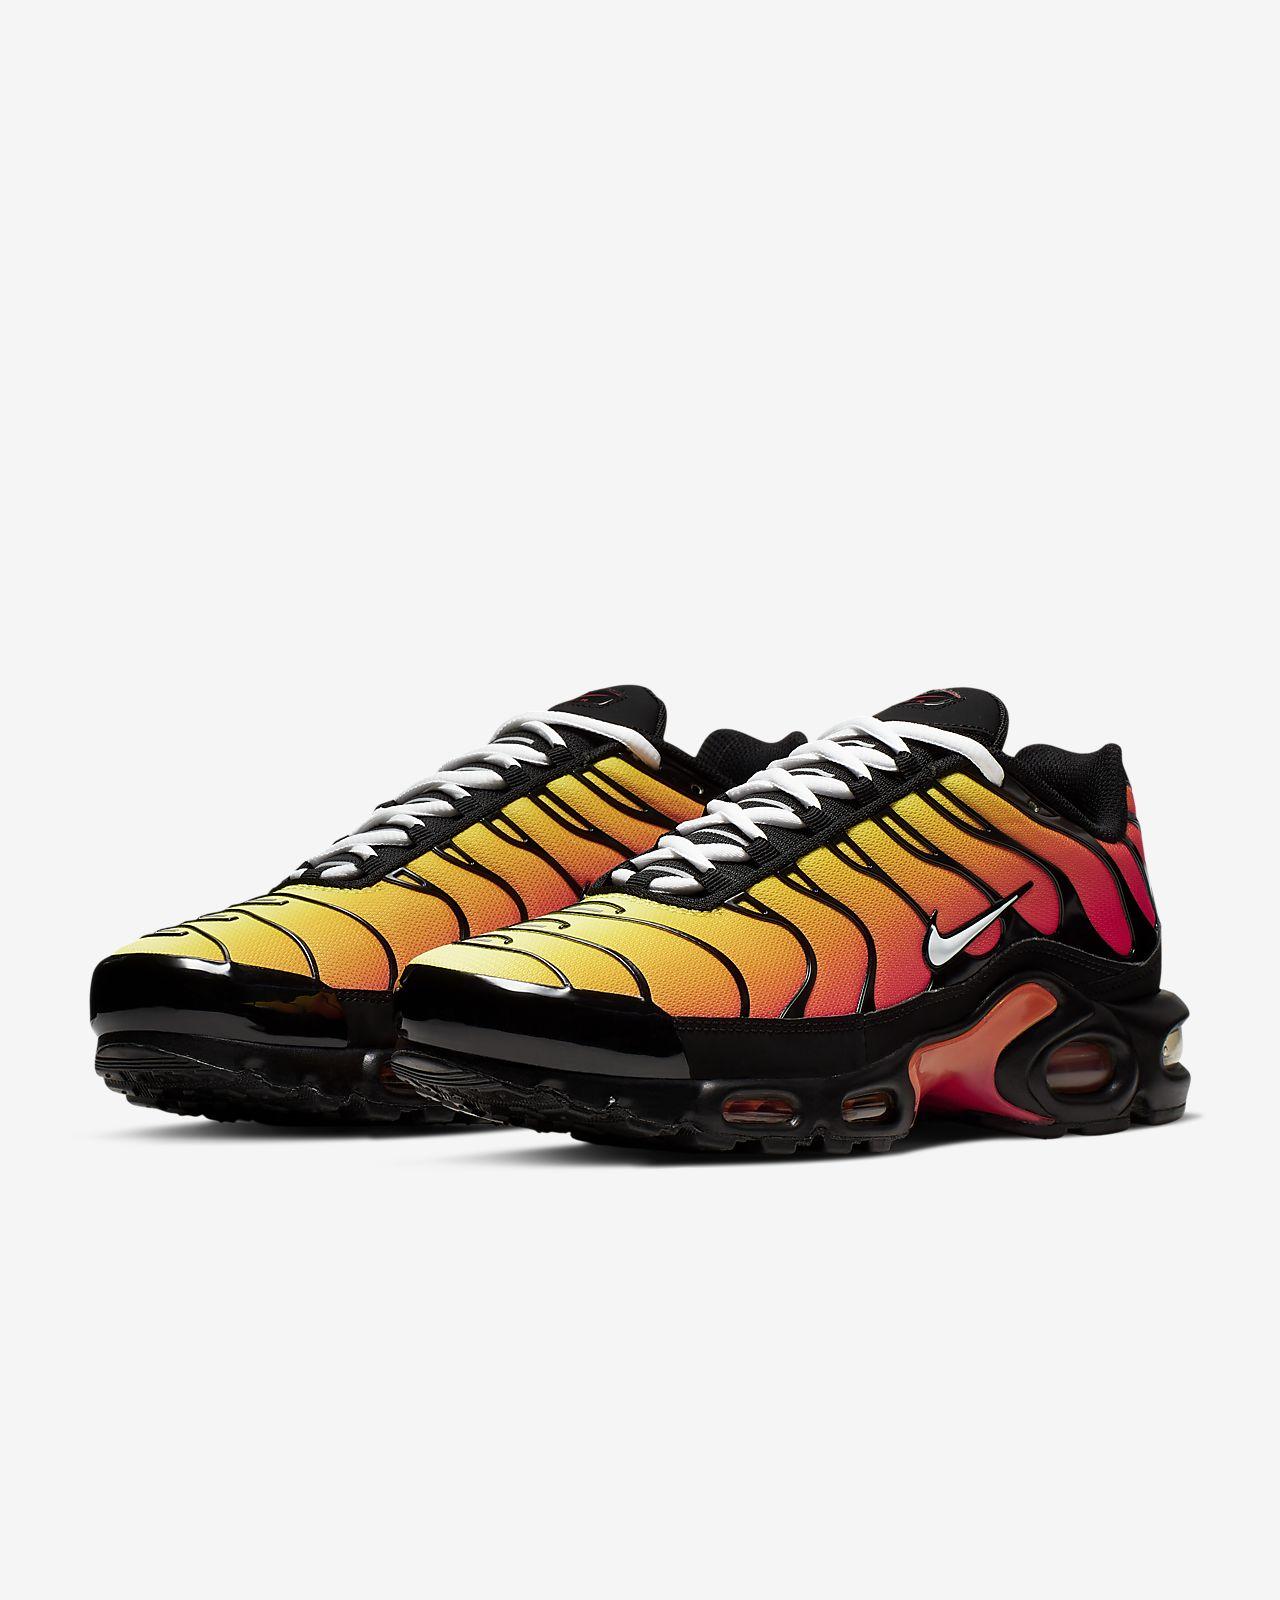 Nike Nike Air 1 1 Max Größentabelle Größentabelle Max Air